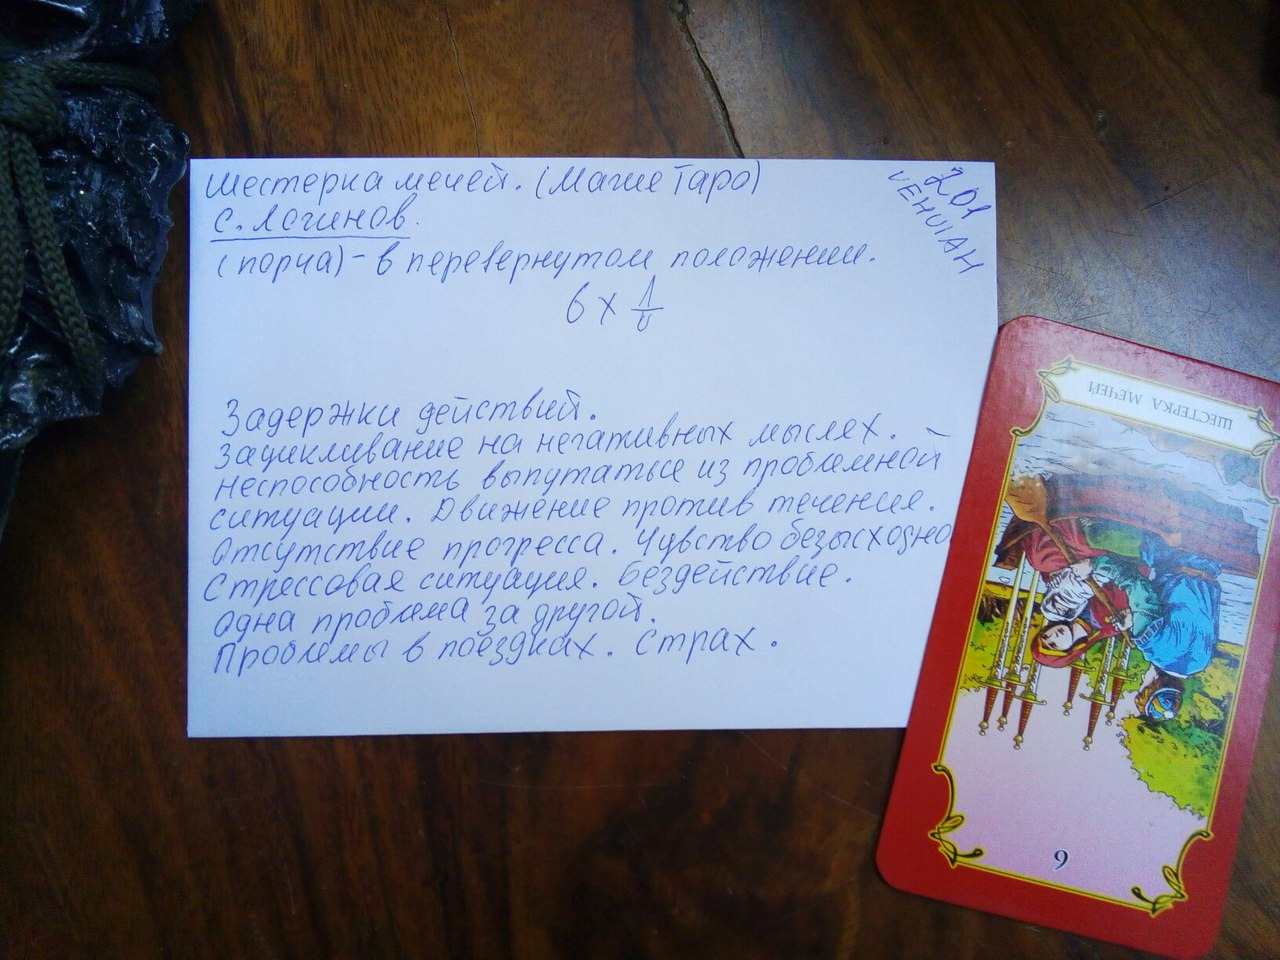 Хештег став на   Салон Магии и Мистики Елены Руденко. Киев ,тел: +380506251562 He2uW-PHb3I